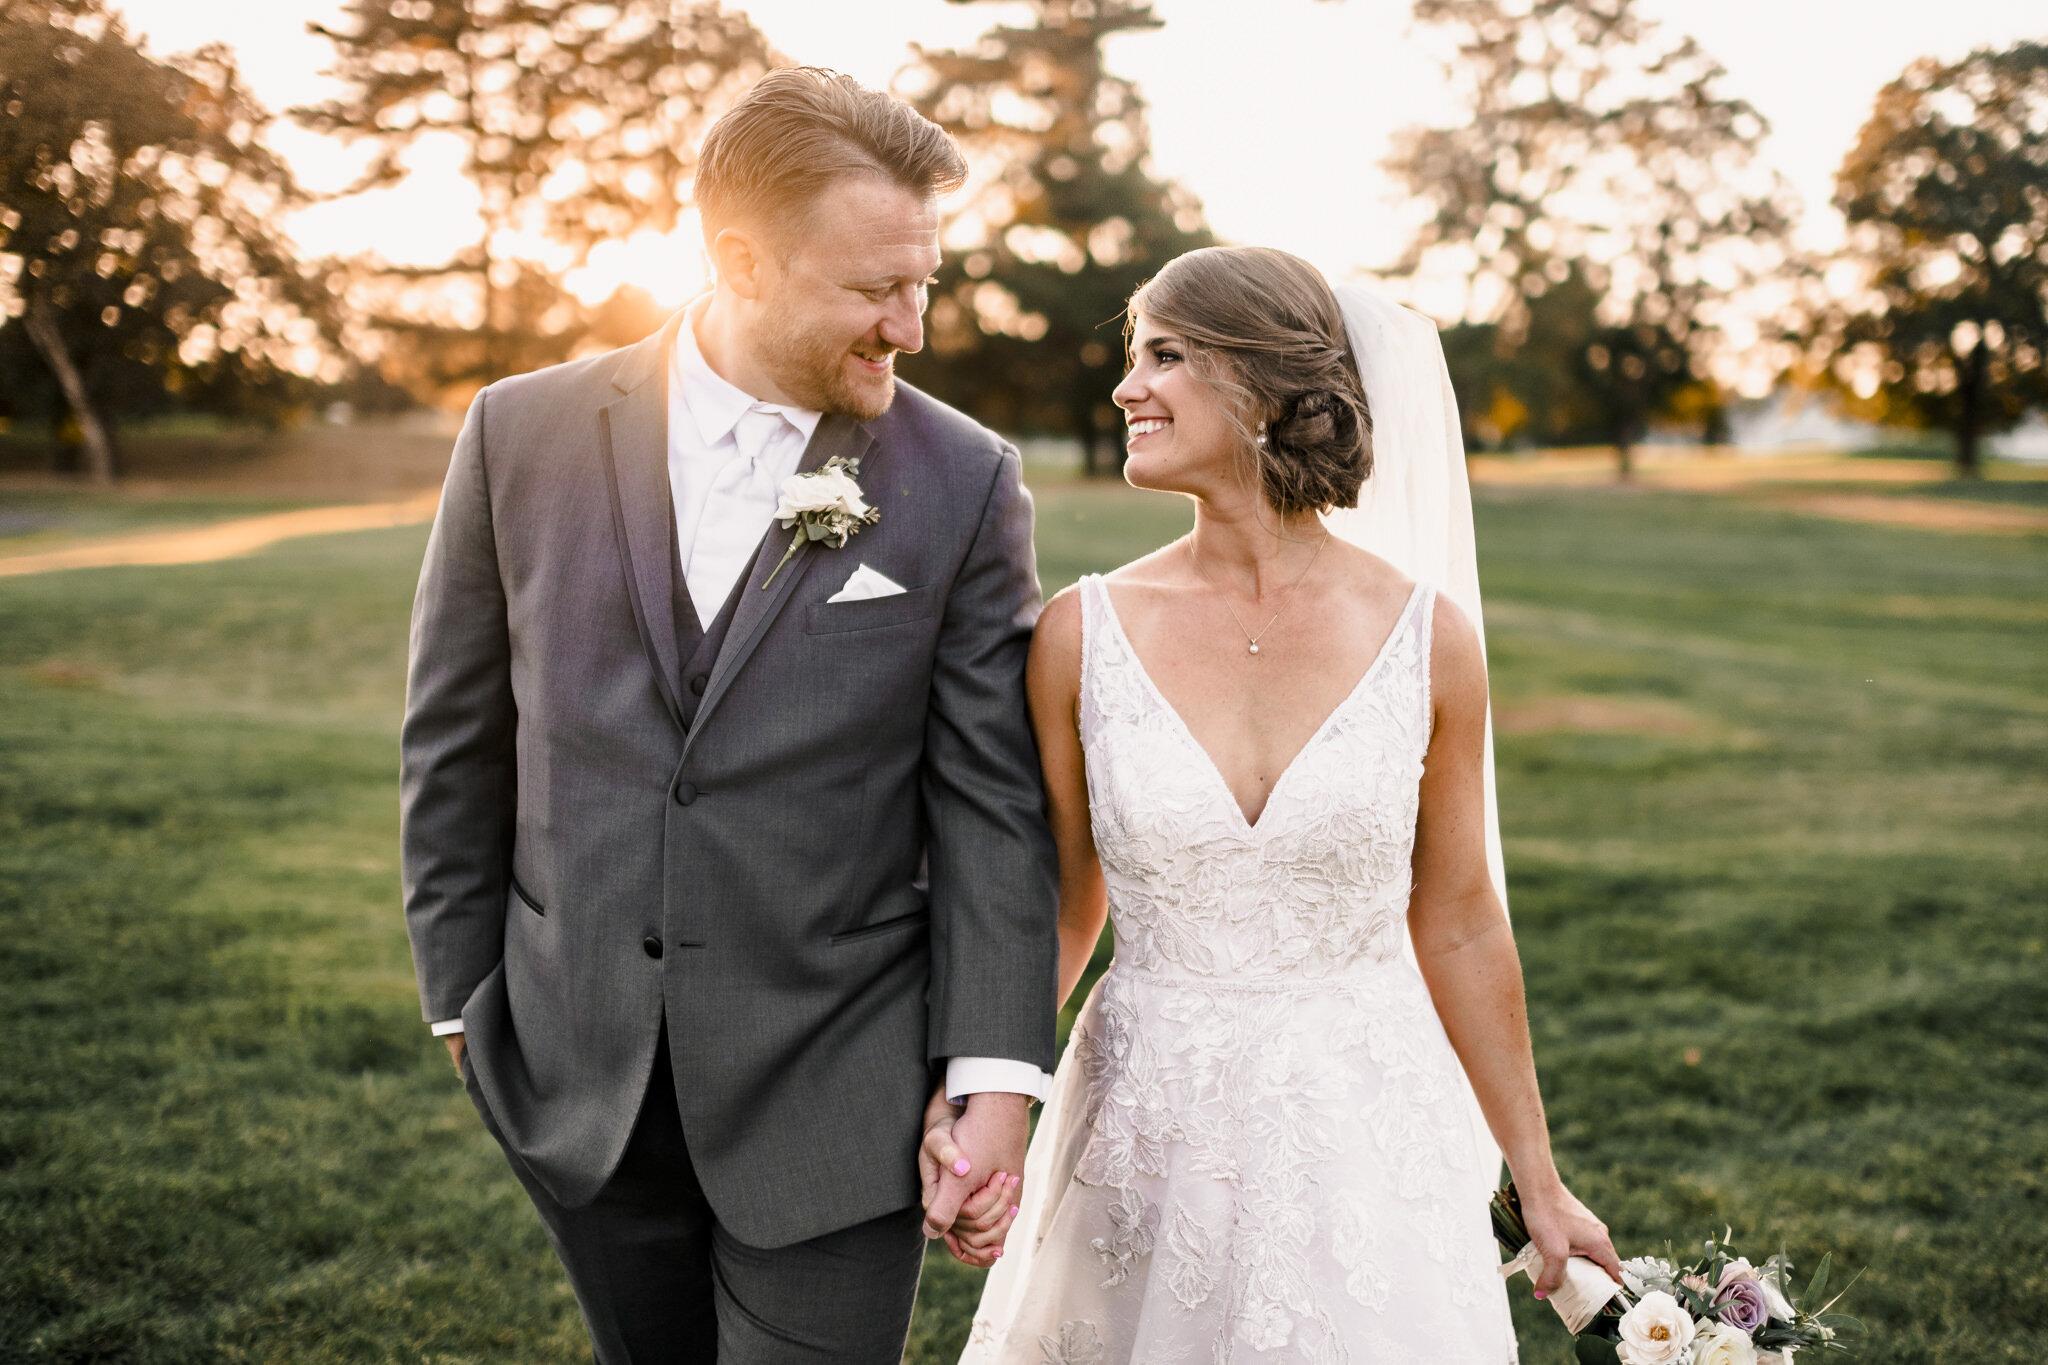 Coyle-Forsgate-Country-Club-Wedding-Photographer-25.JPG